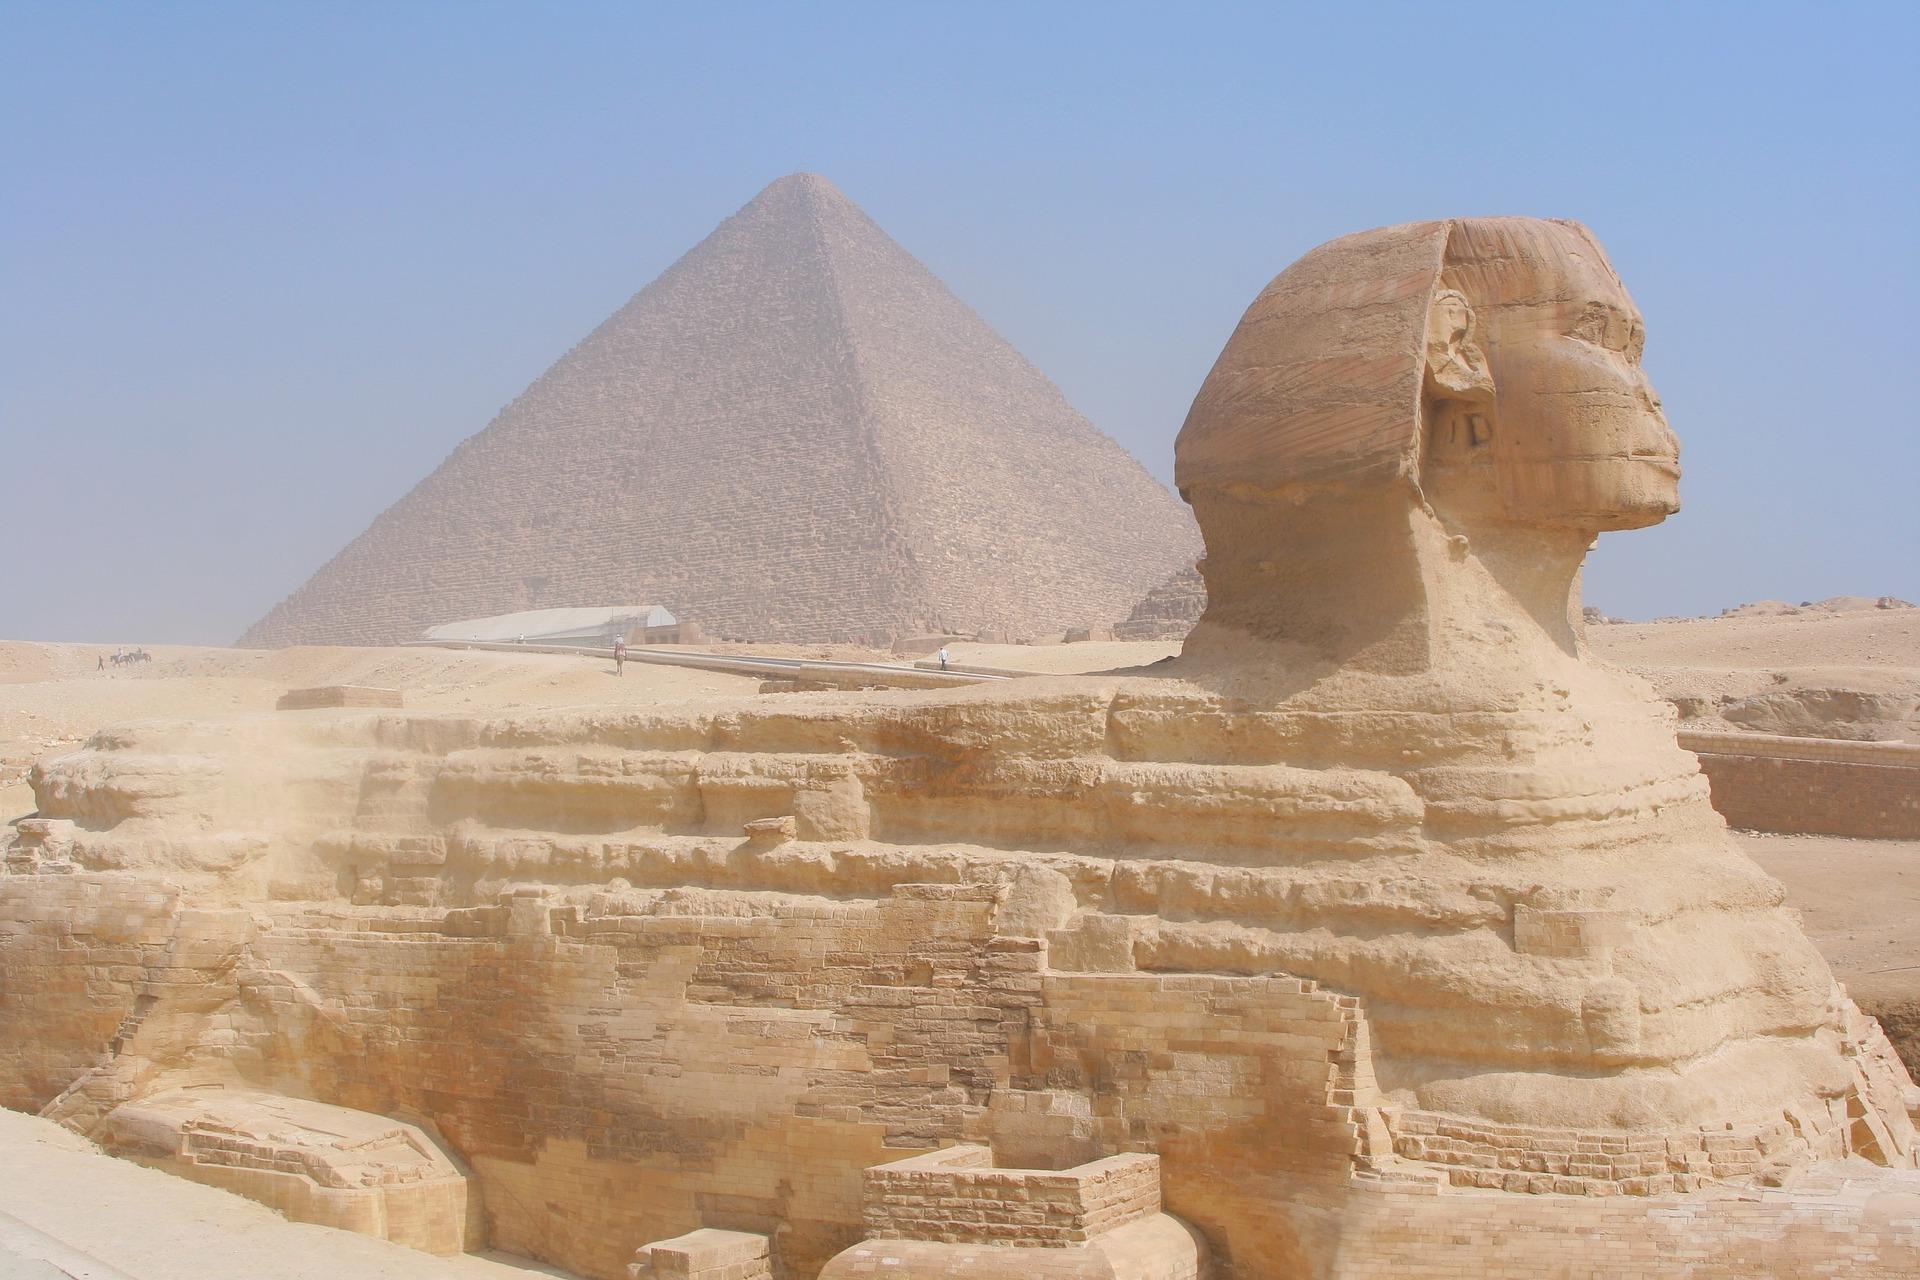 Sphinx at the Pyramids at Giza, Egypt